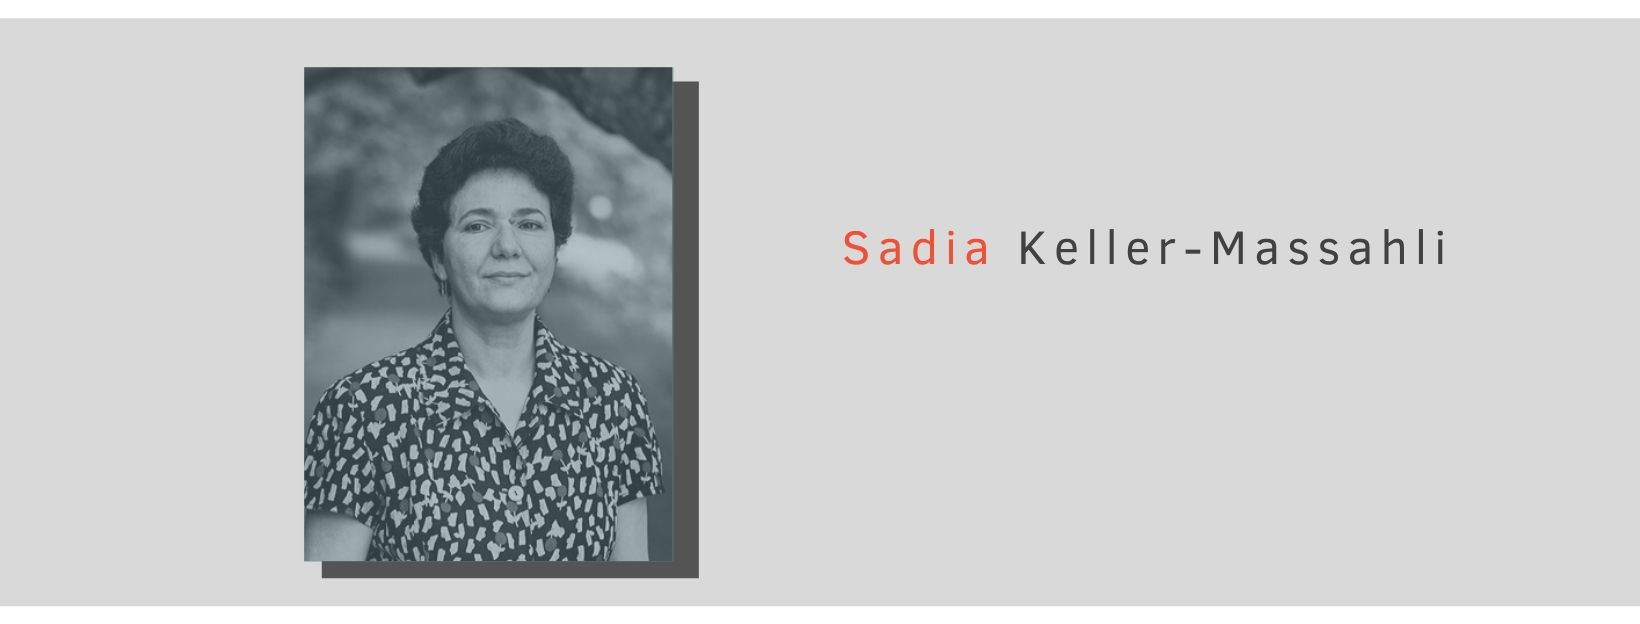 Sadia Keller